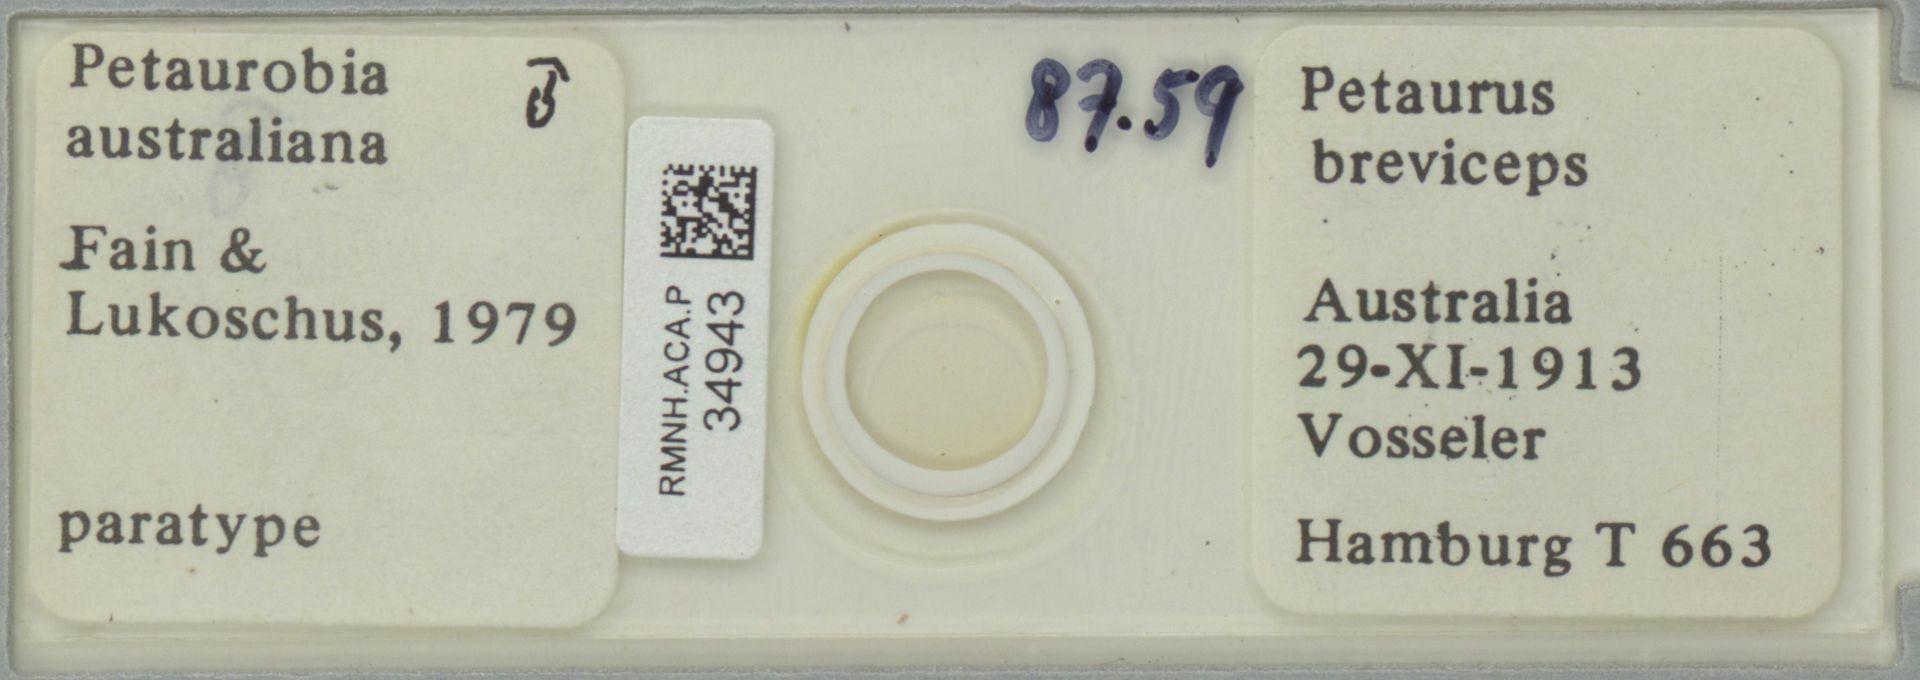 RMNH.ACA.P.34943   Petaurobia australiana Fain & Lukoschus, 1979